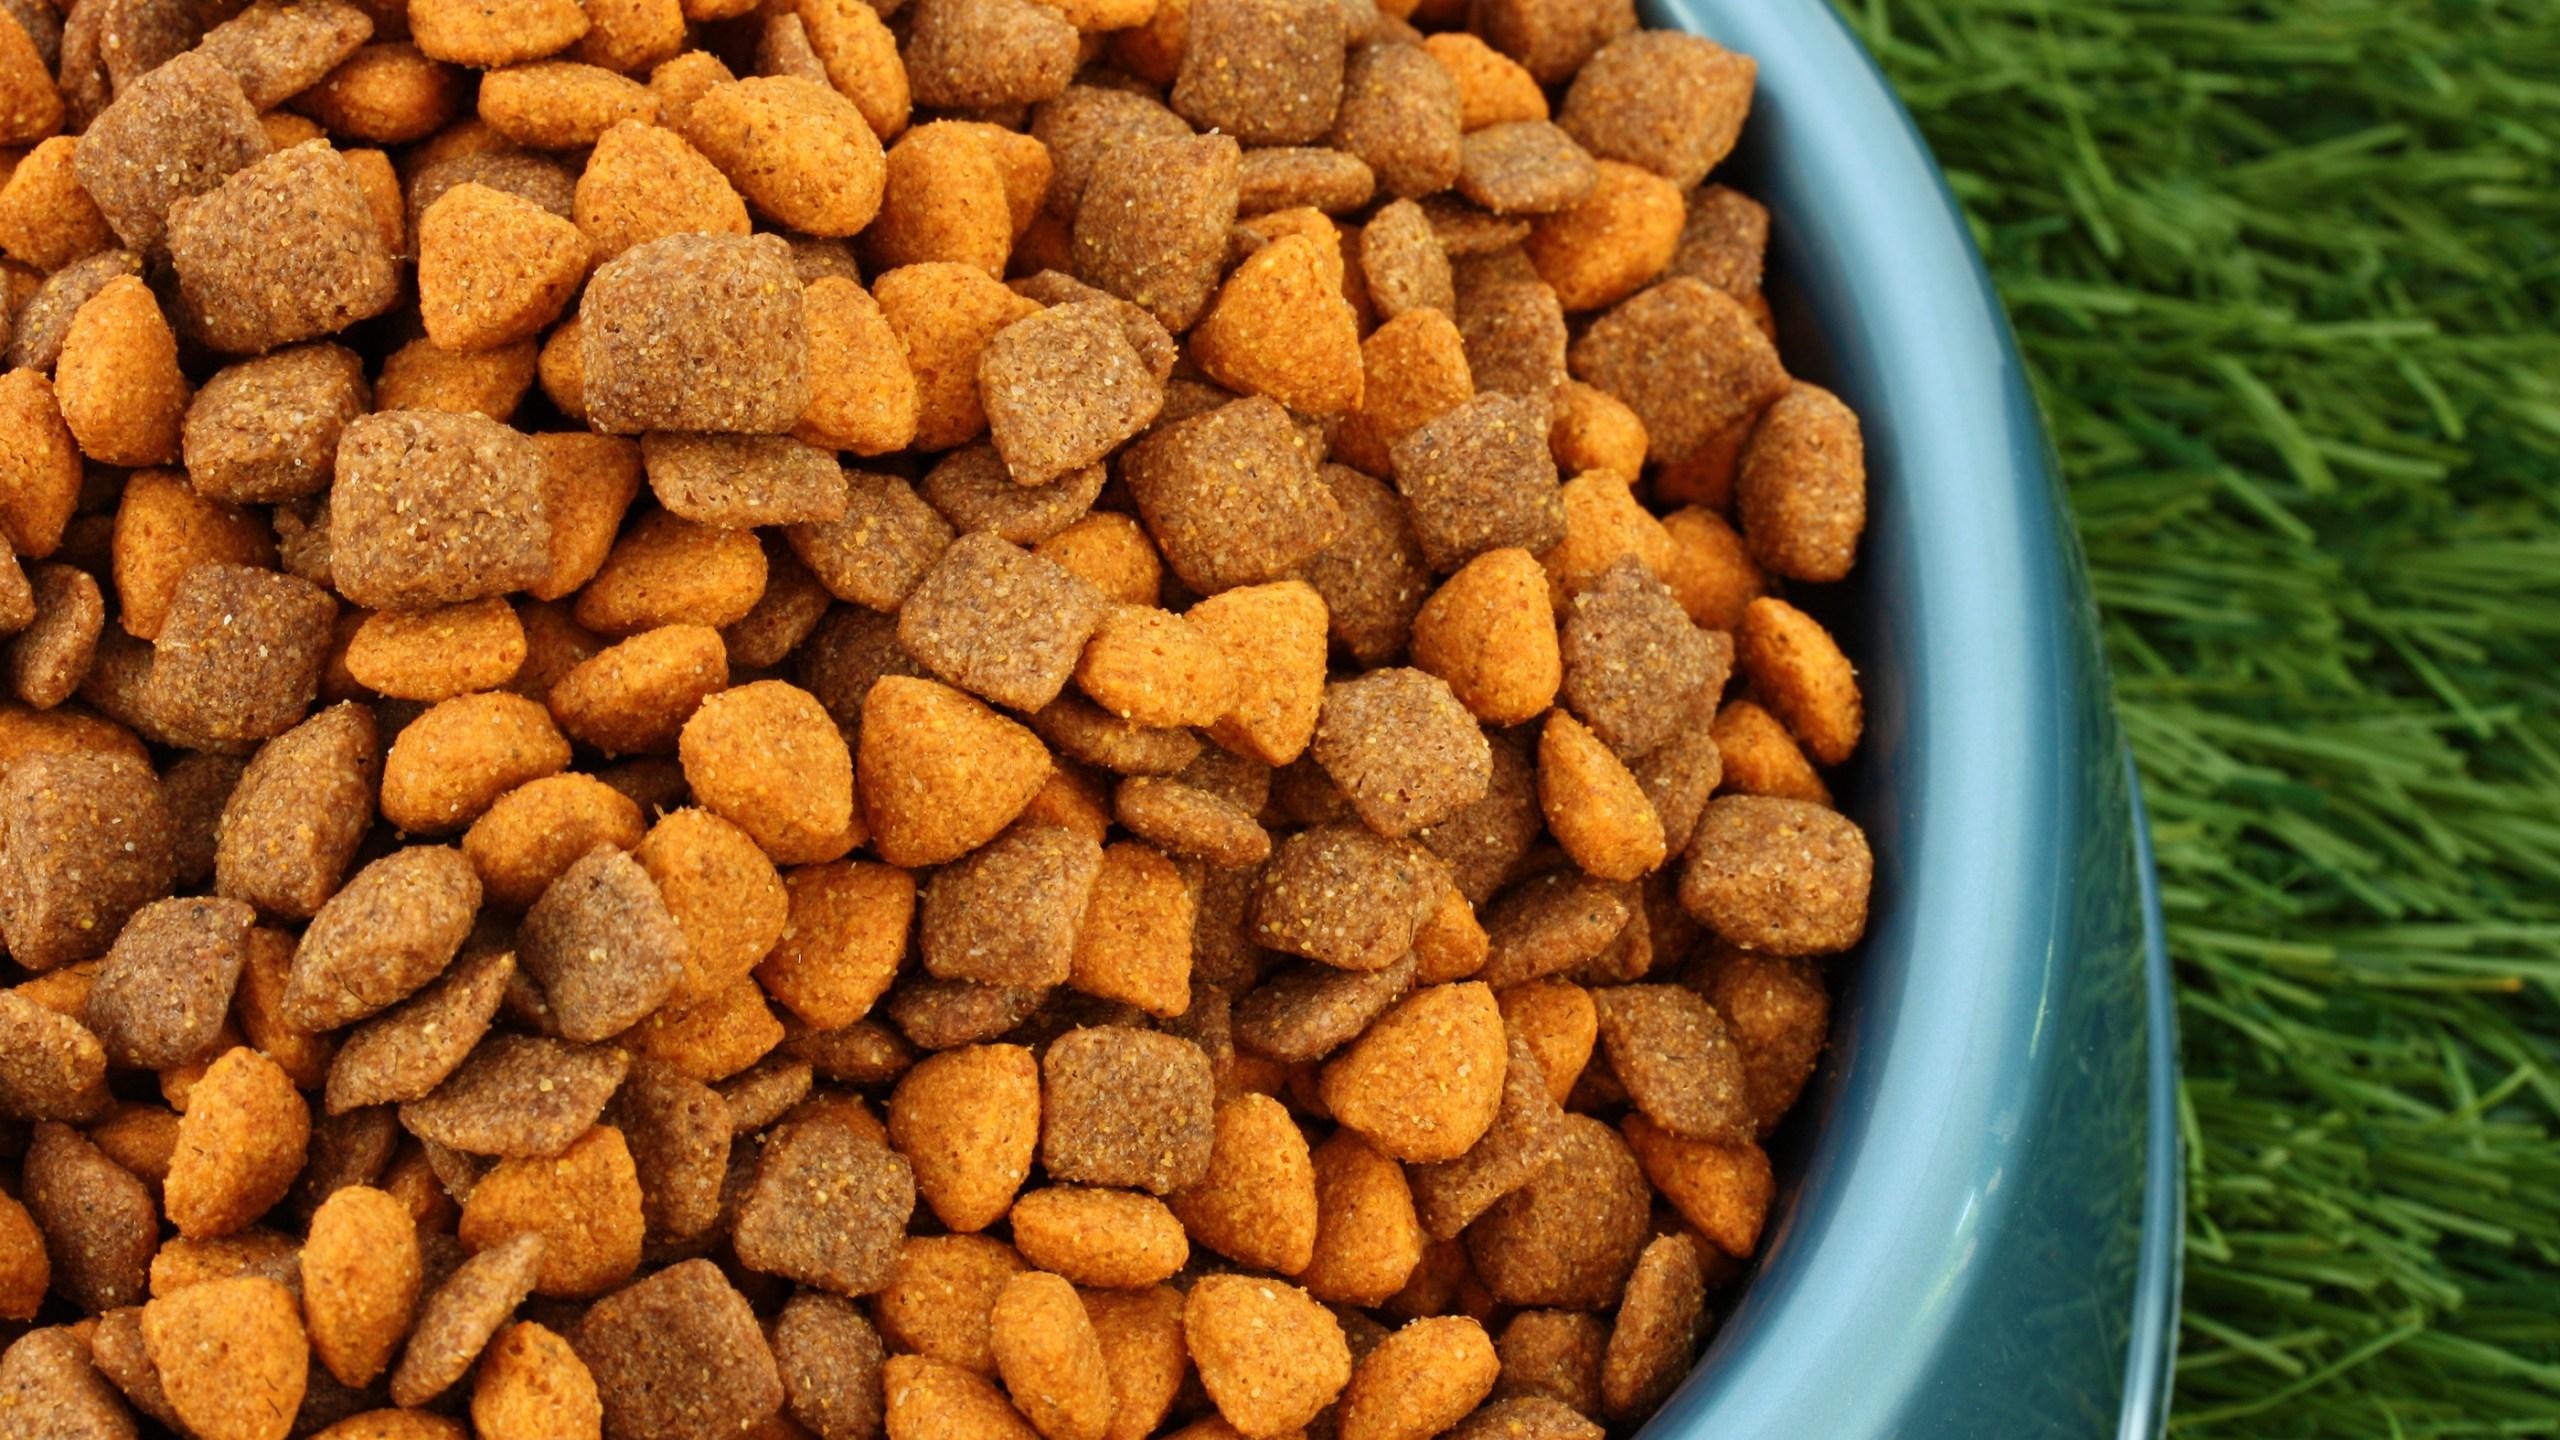 Dog Food | WTNH com